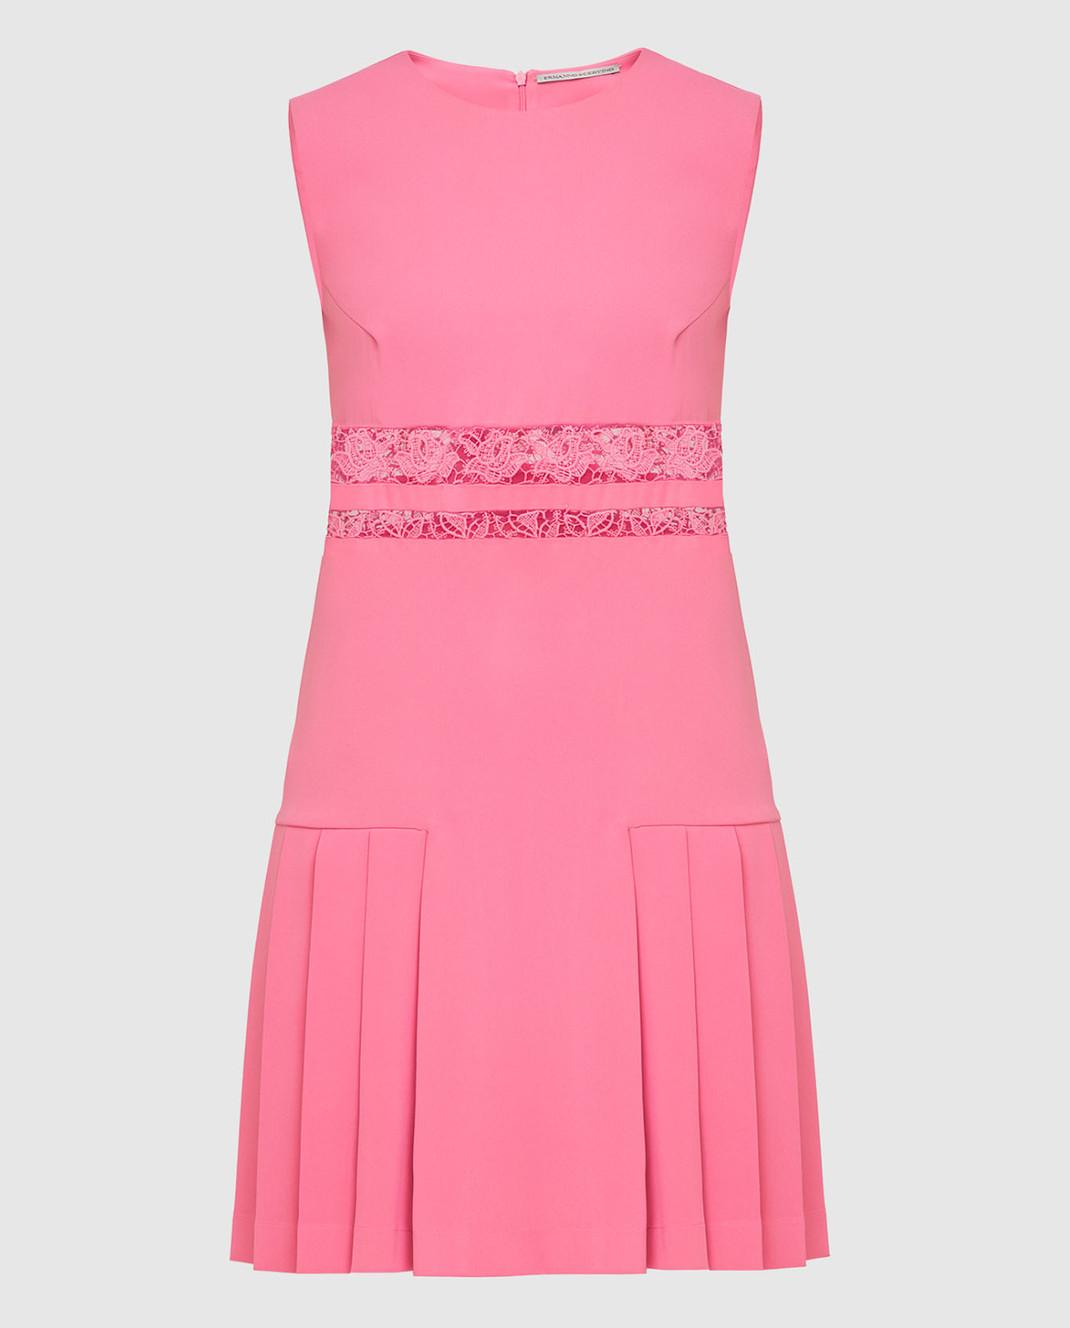 Ermanno Scervino Розовое платье изображение 1